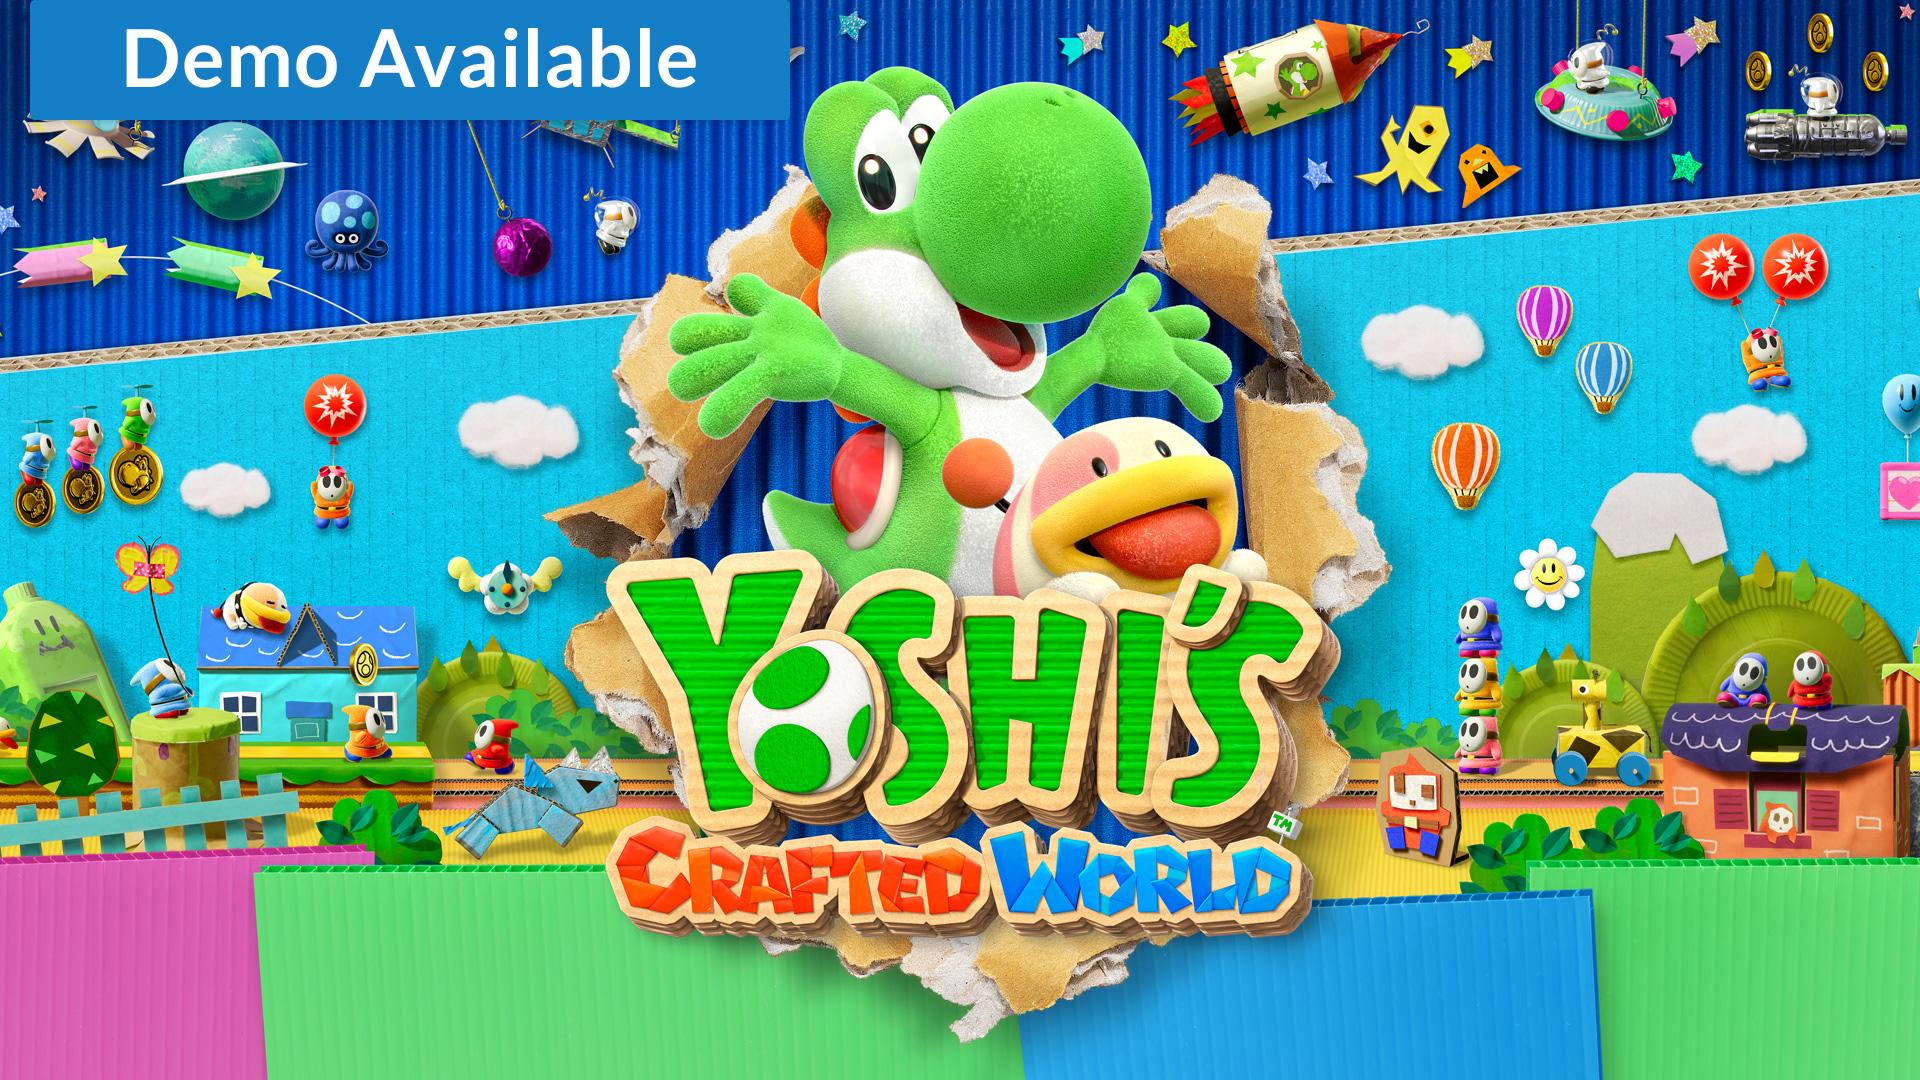 Yoshi created the world